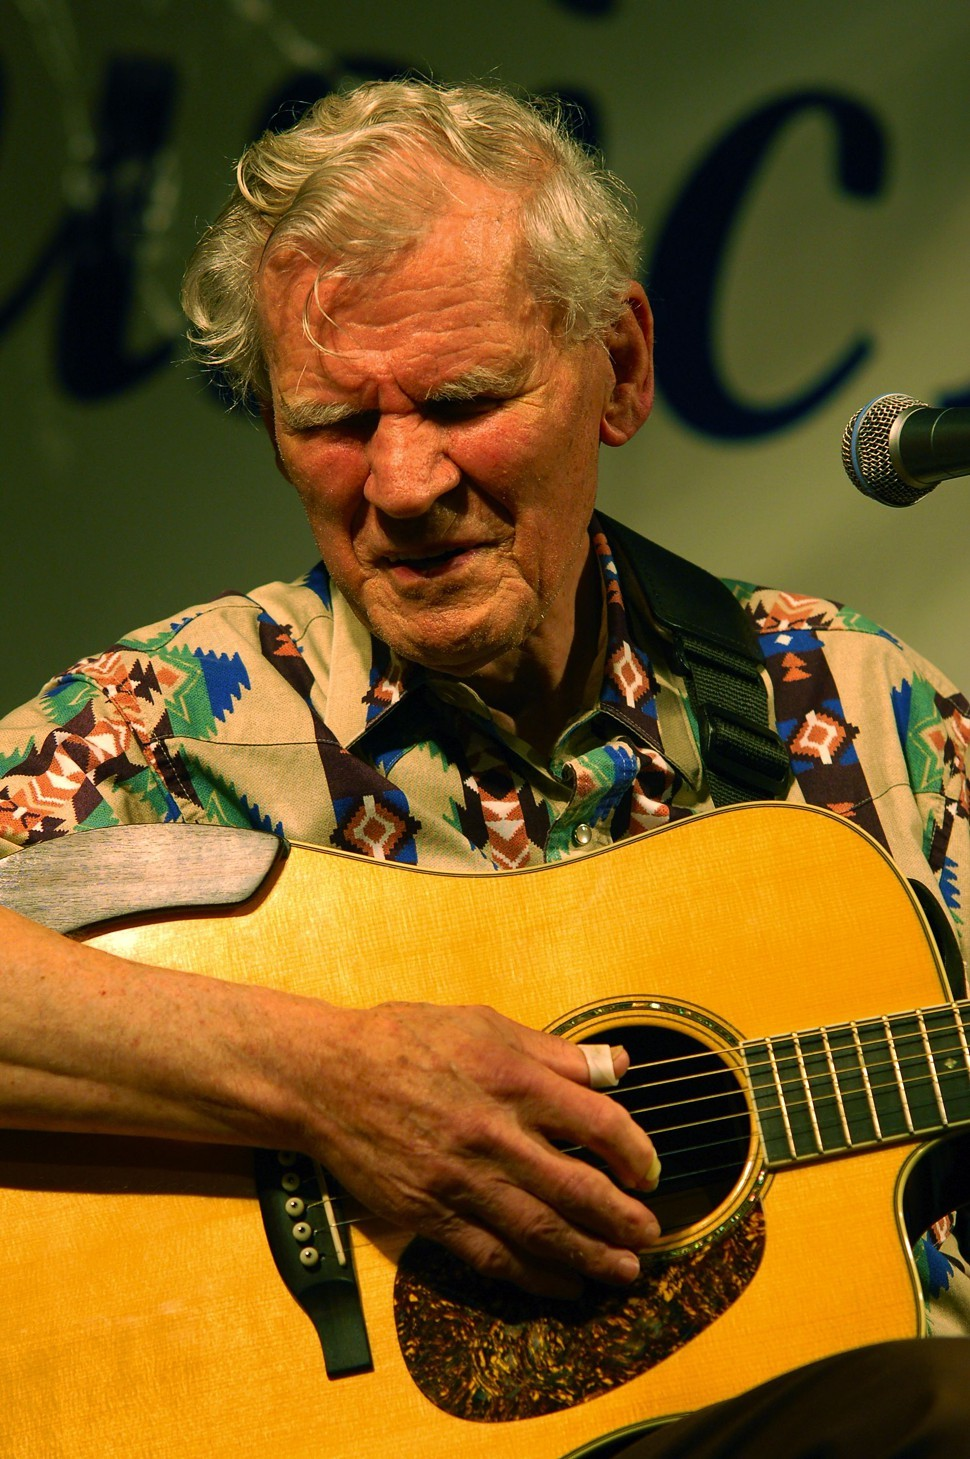 Watson at the Sugar Grove Music Festival in 2009